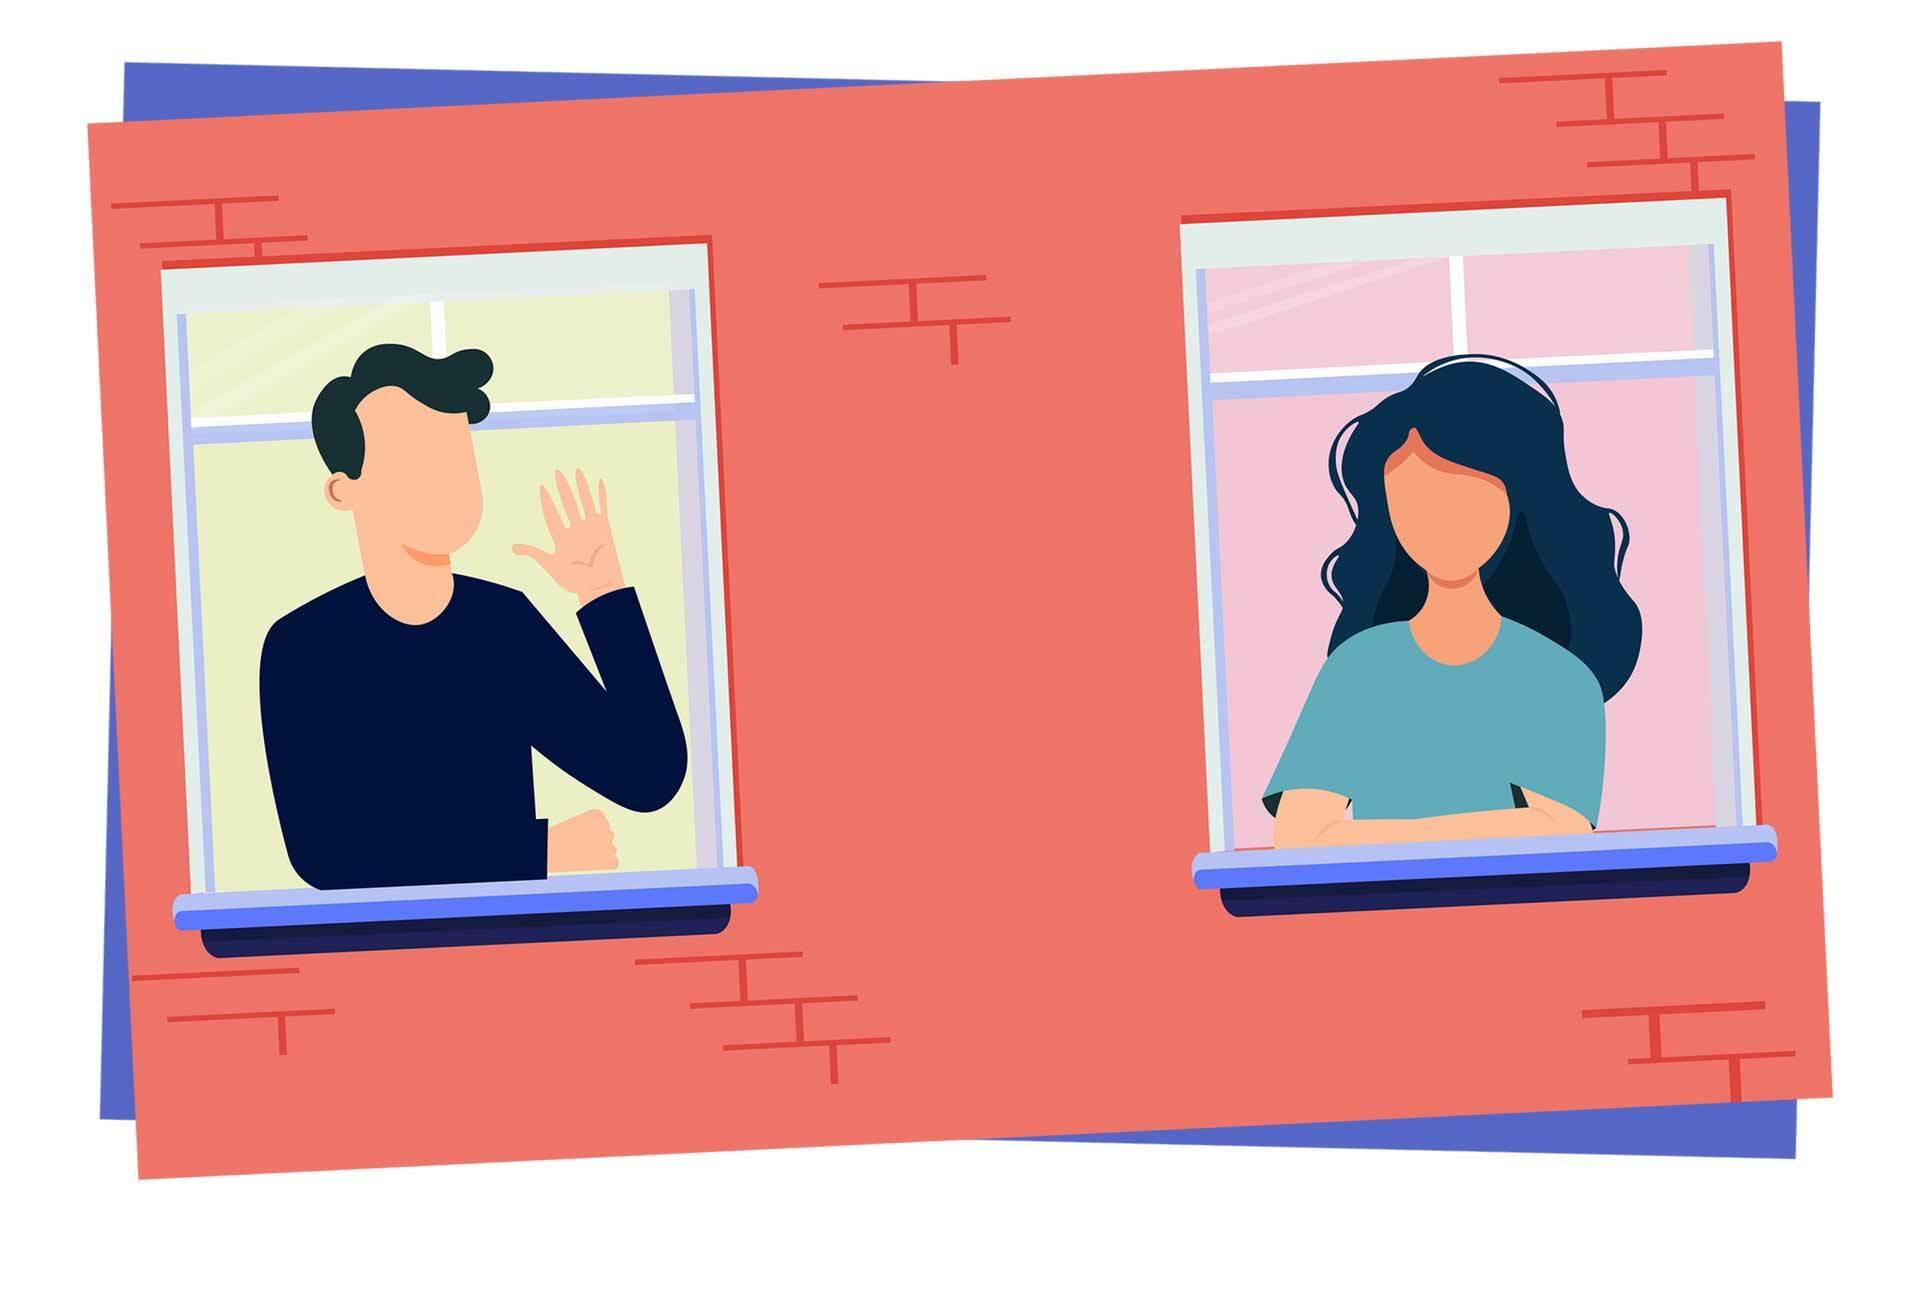 Chat und Cybersex turnen mich an trotz Beziehung !?